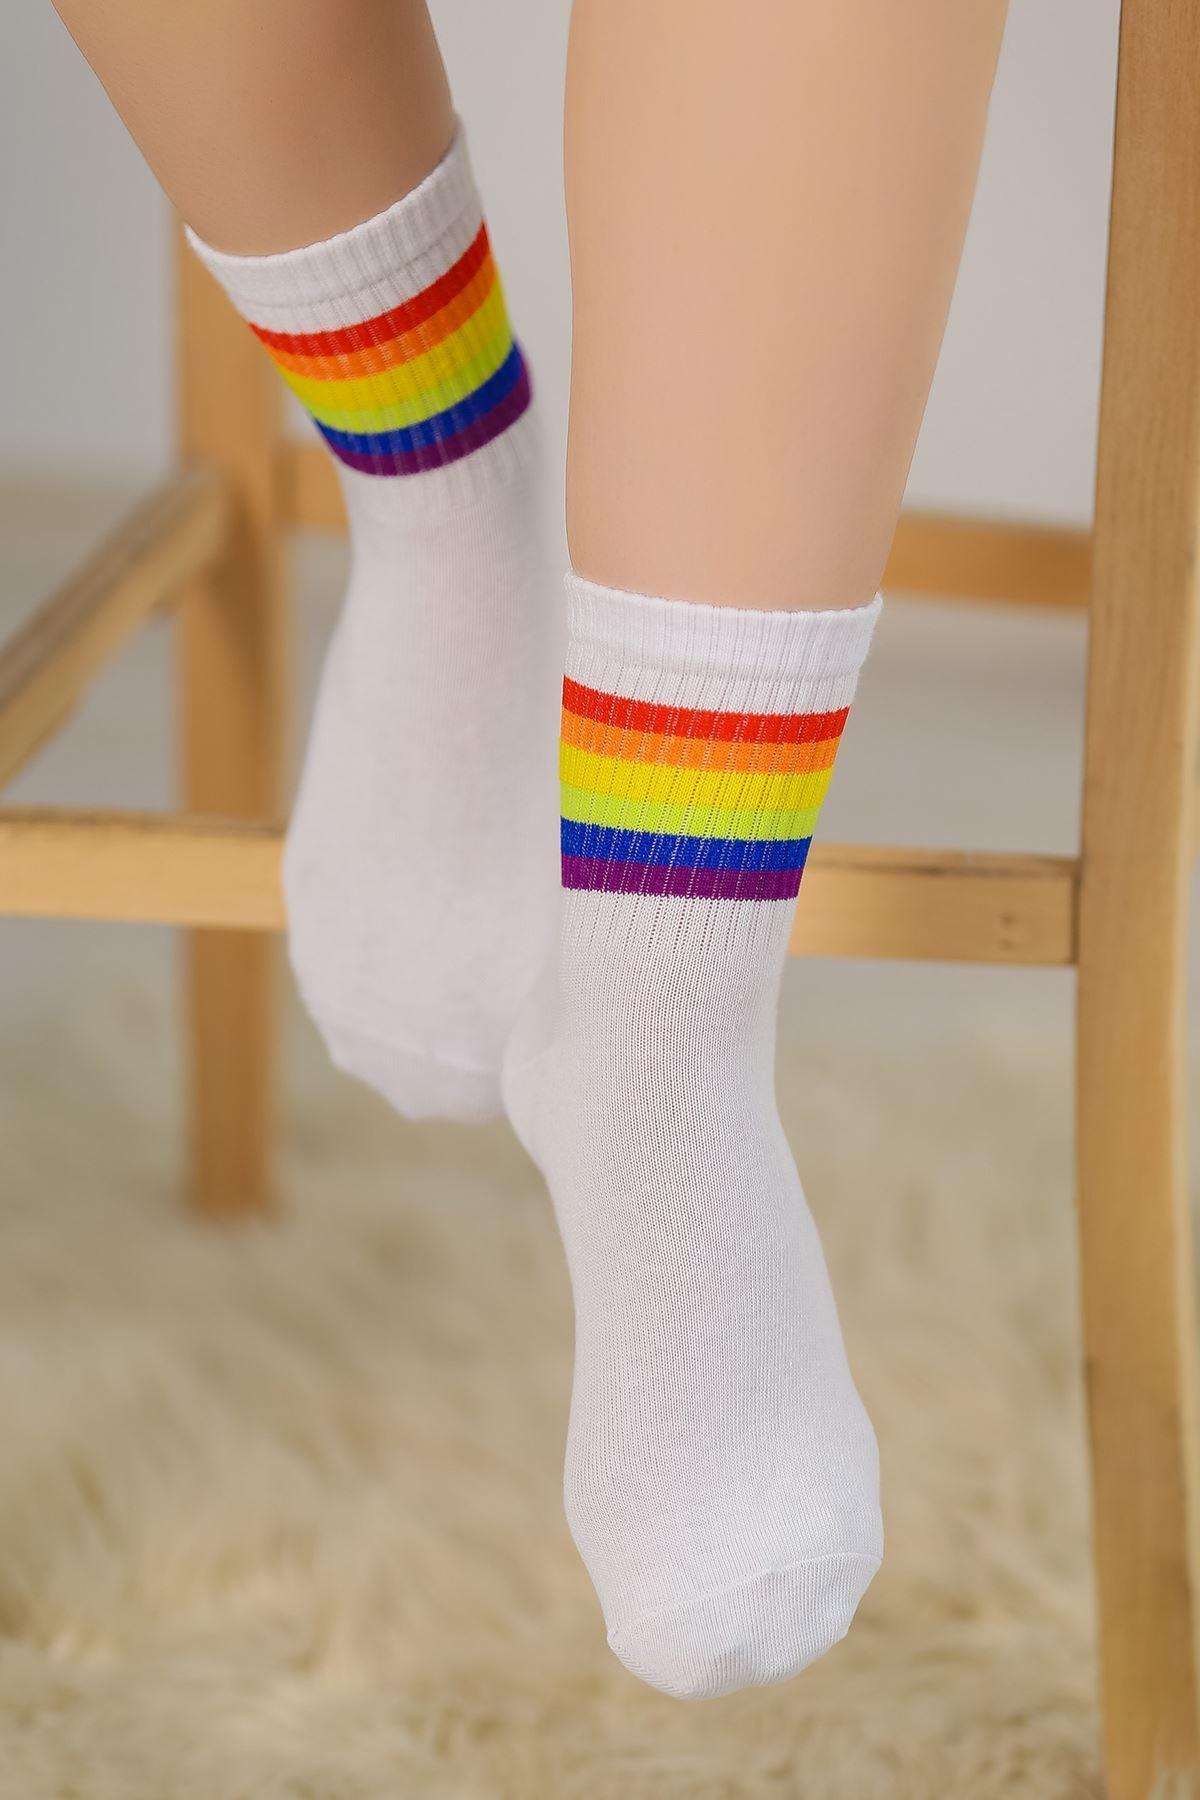 Soket Çorap Renklibeyaz - 10101.1114.